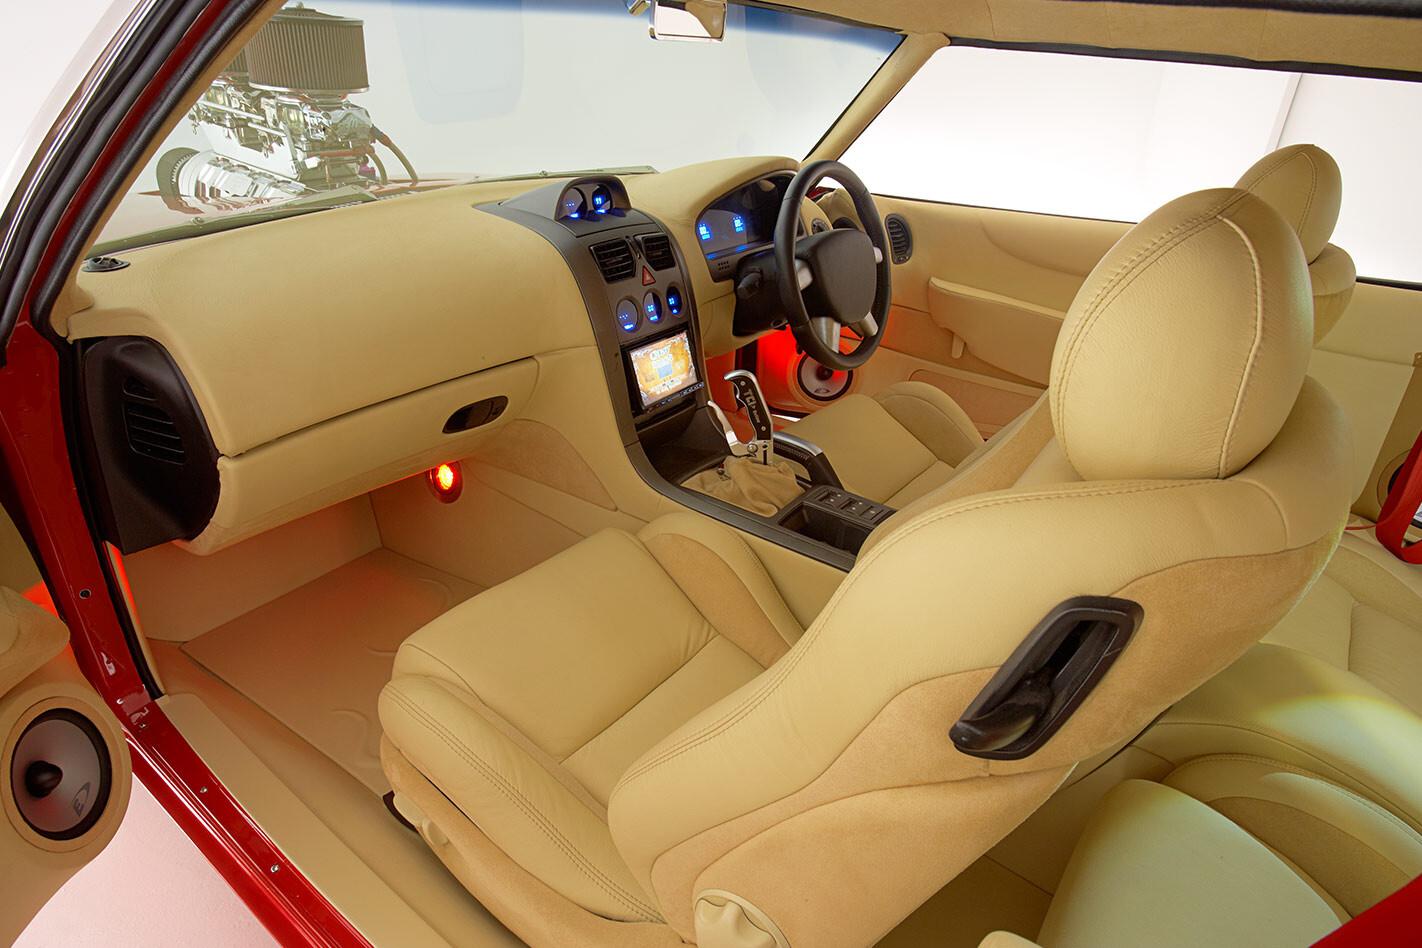 Holden HQ Monaro interior